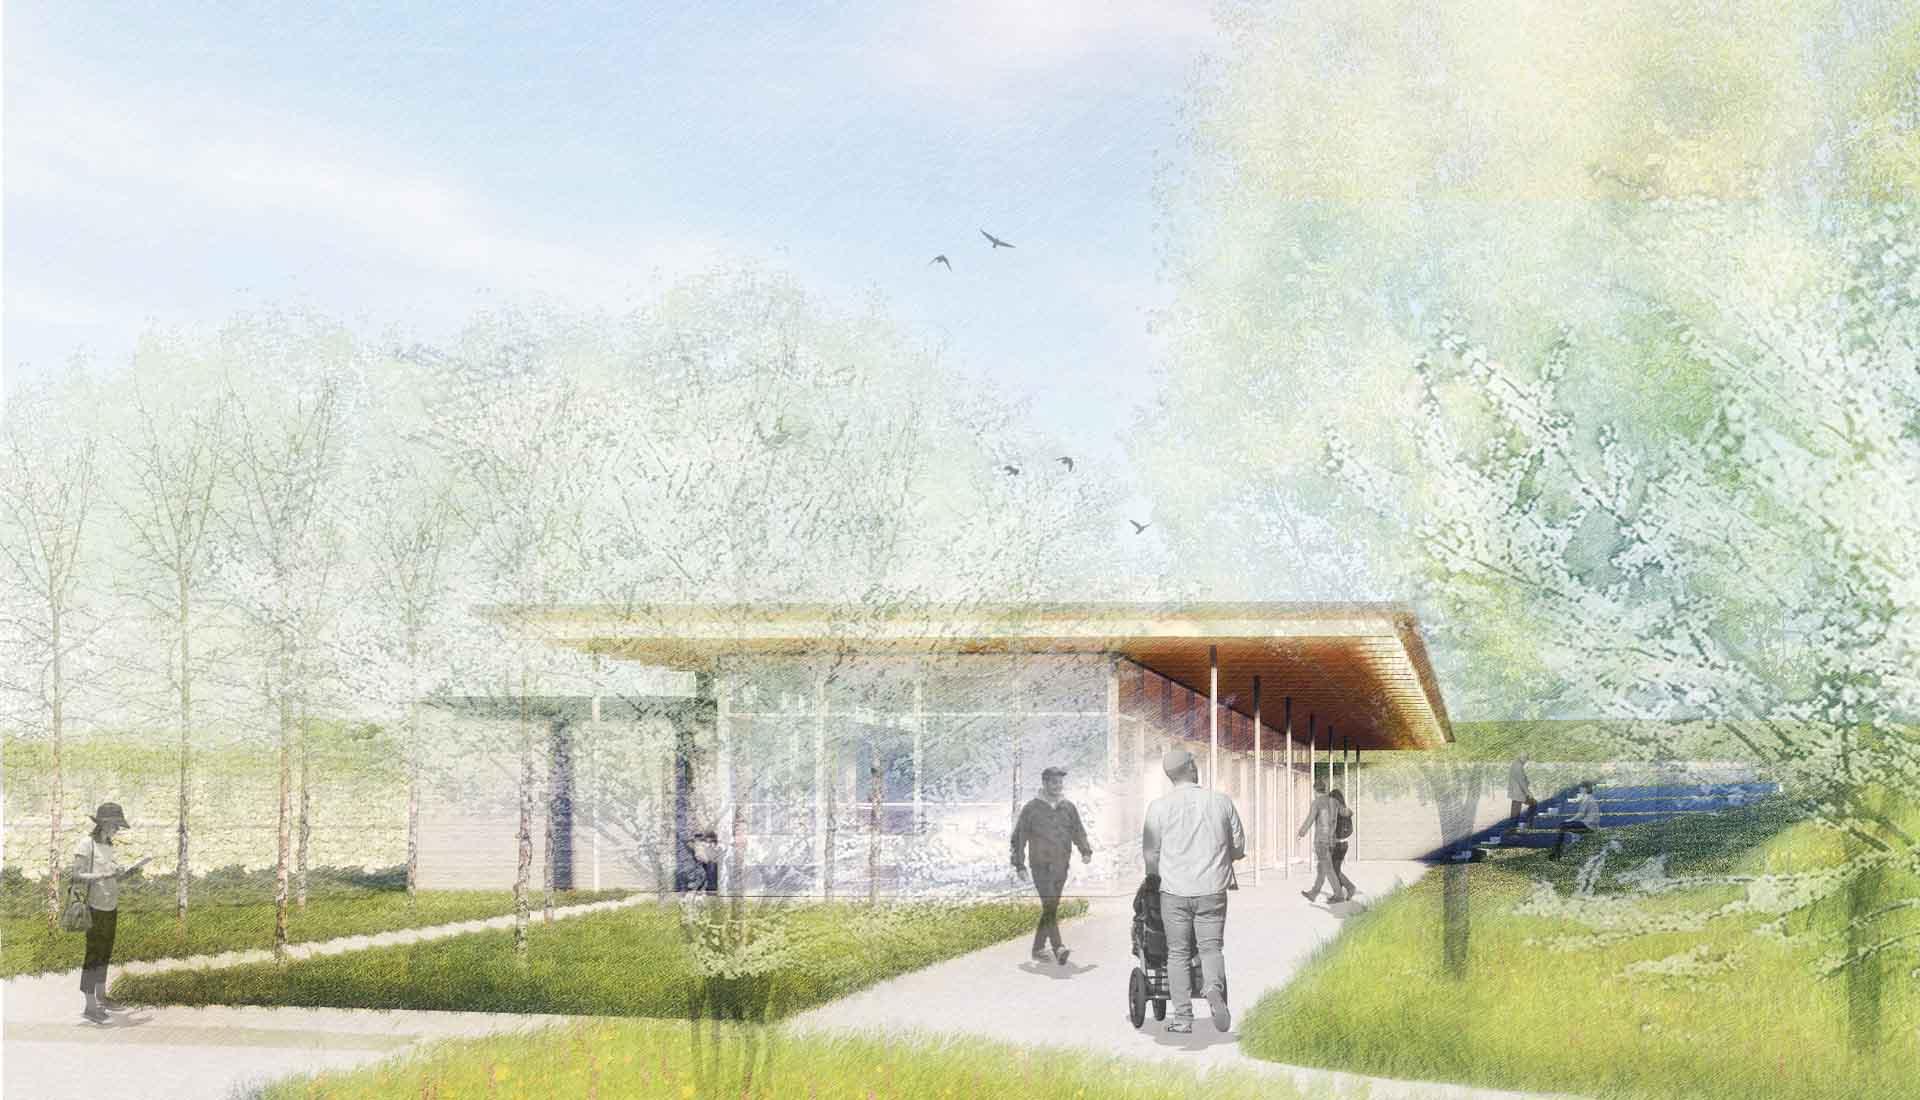 Arbolope Studio | Landscape Architects + Urban Designers | Krauss House Visitor Center